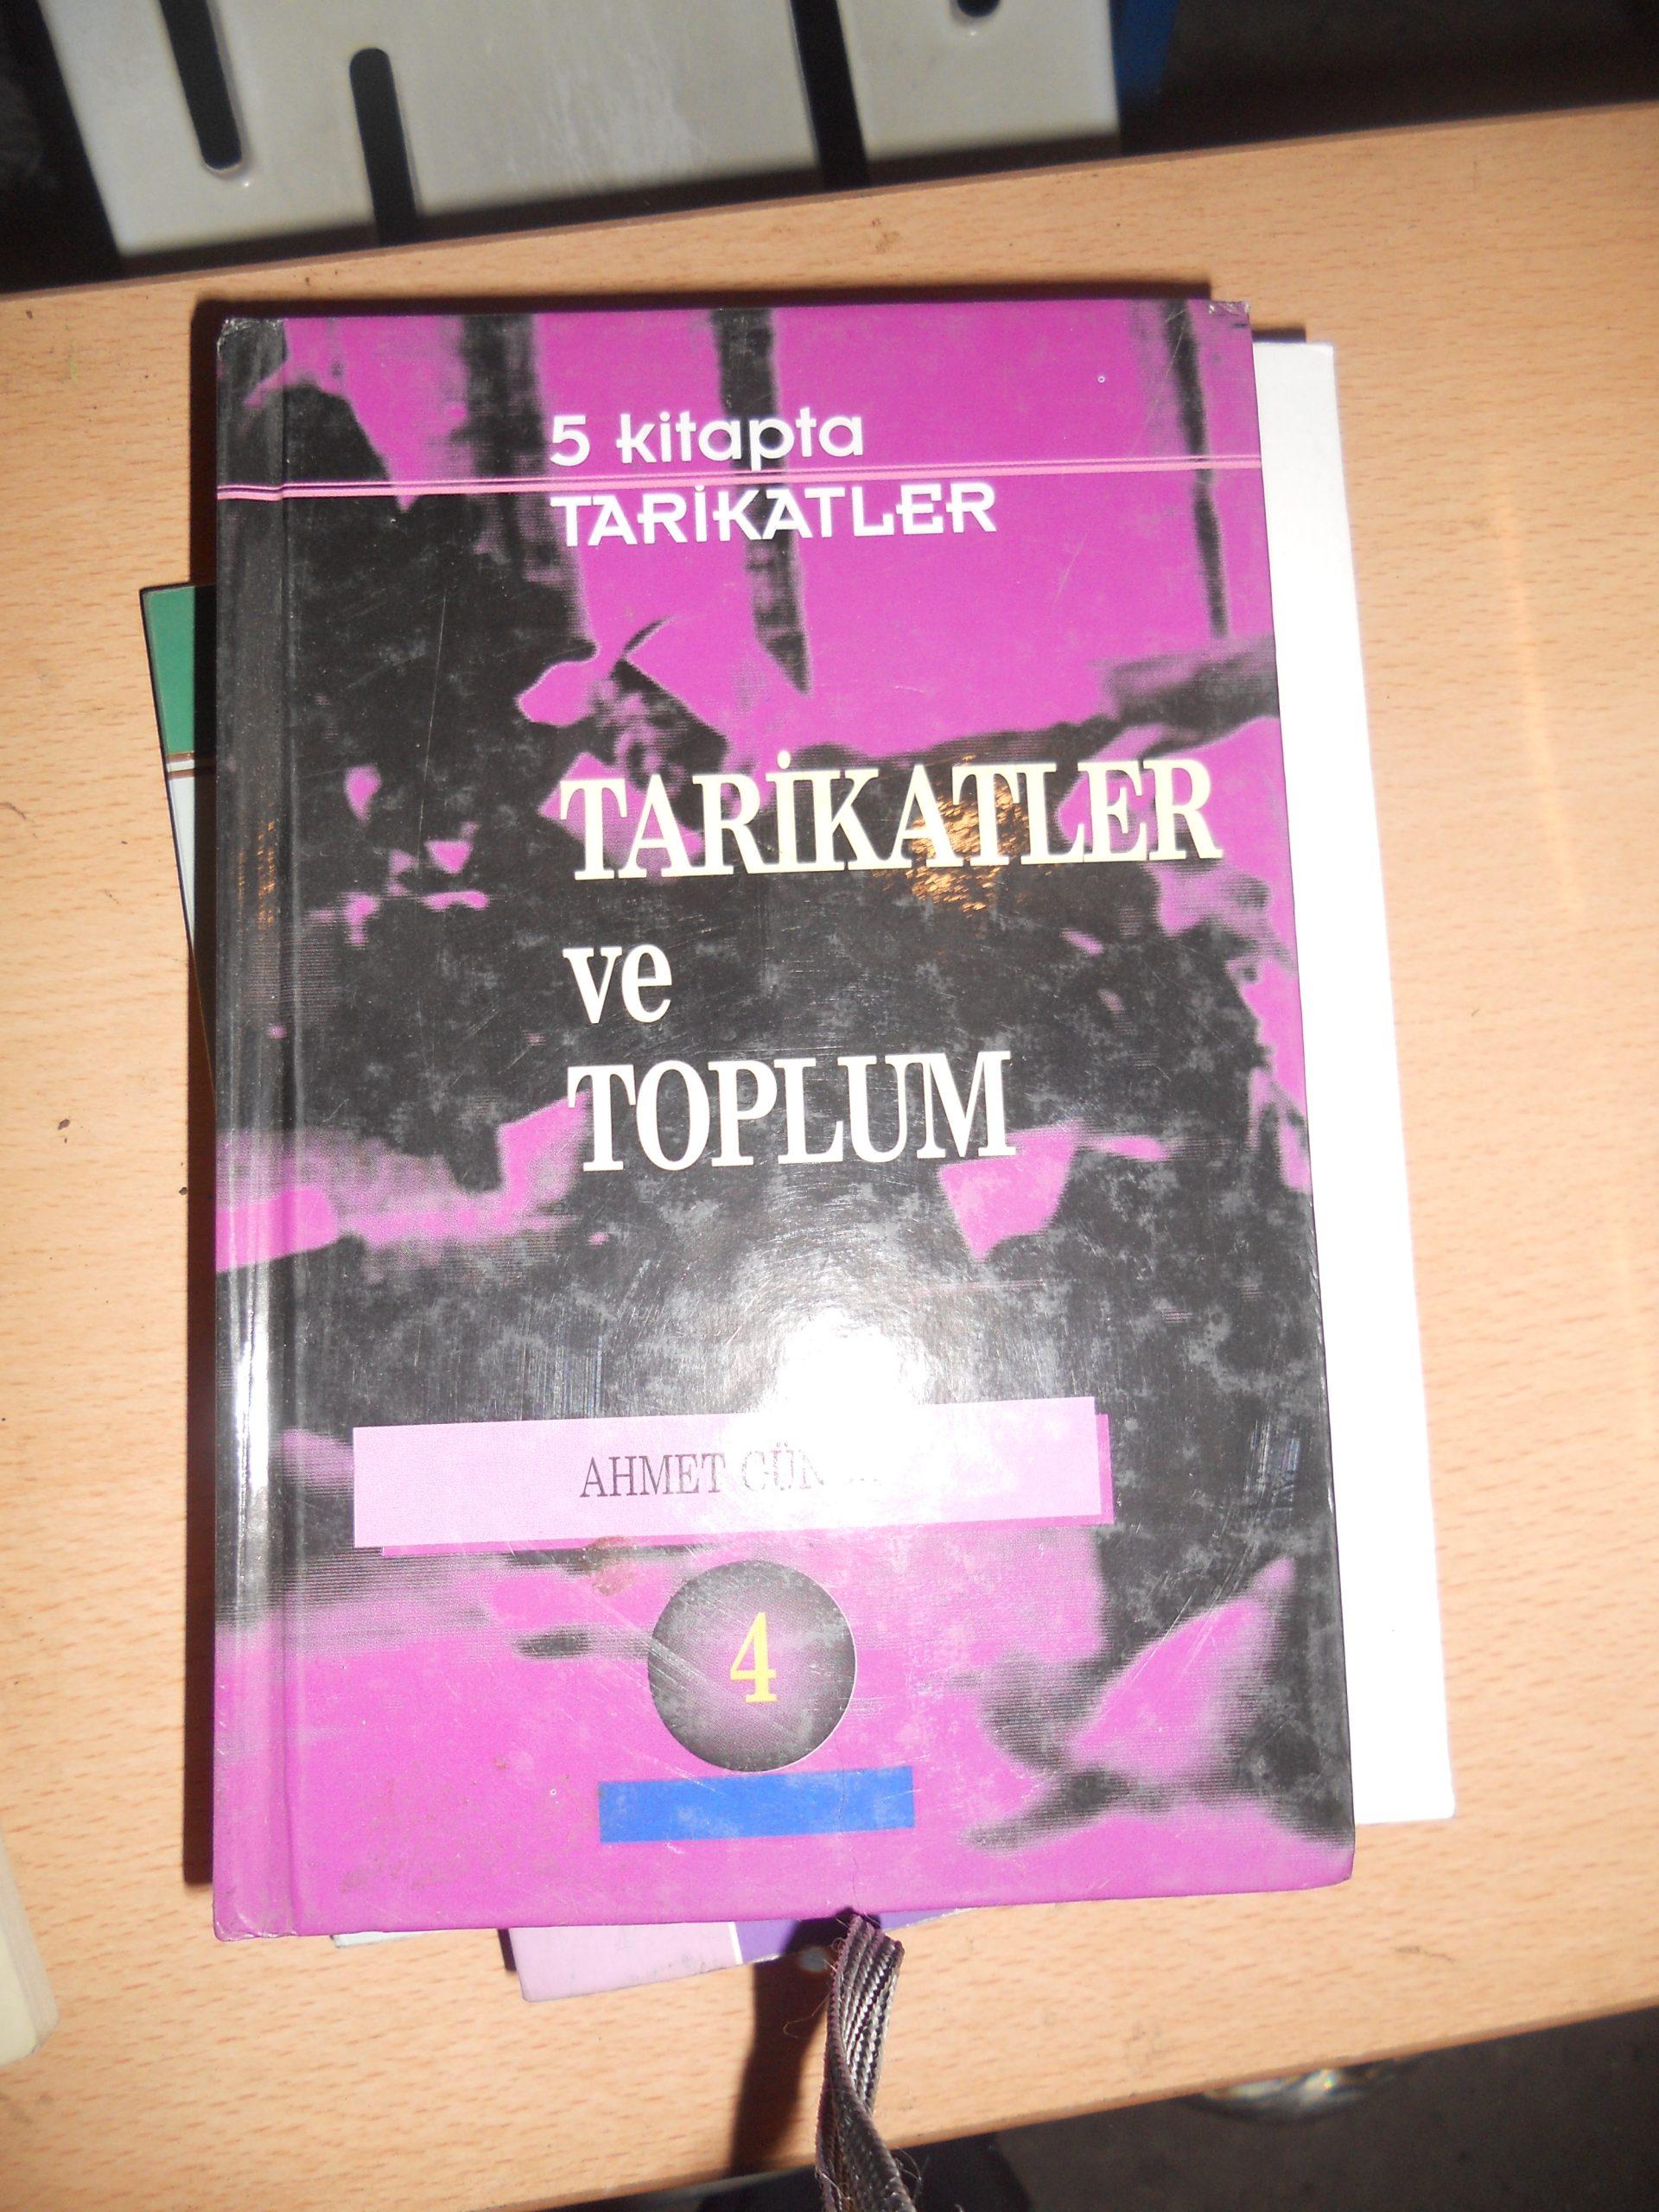 TARİKATLER ve TOPLUM/Ahmet GÜNER/ 7,5 TL